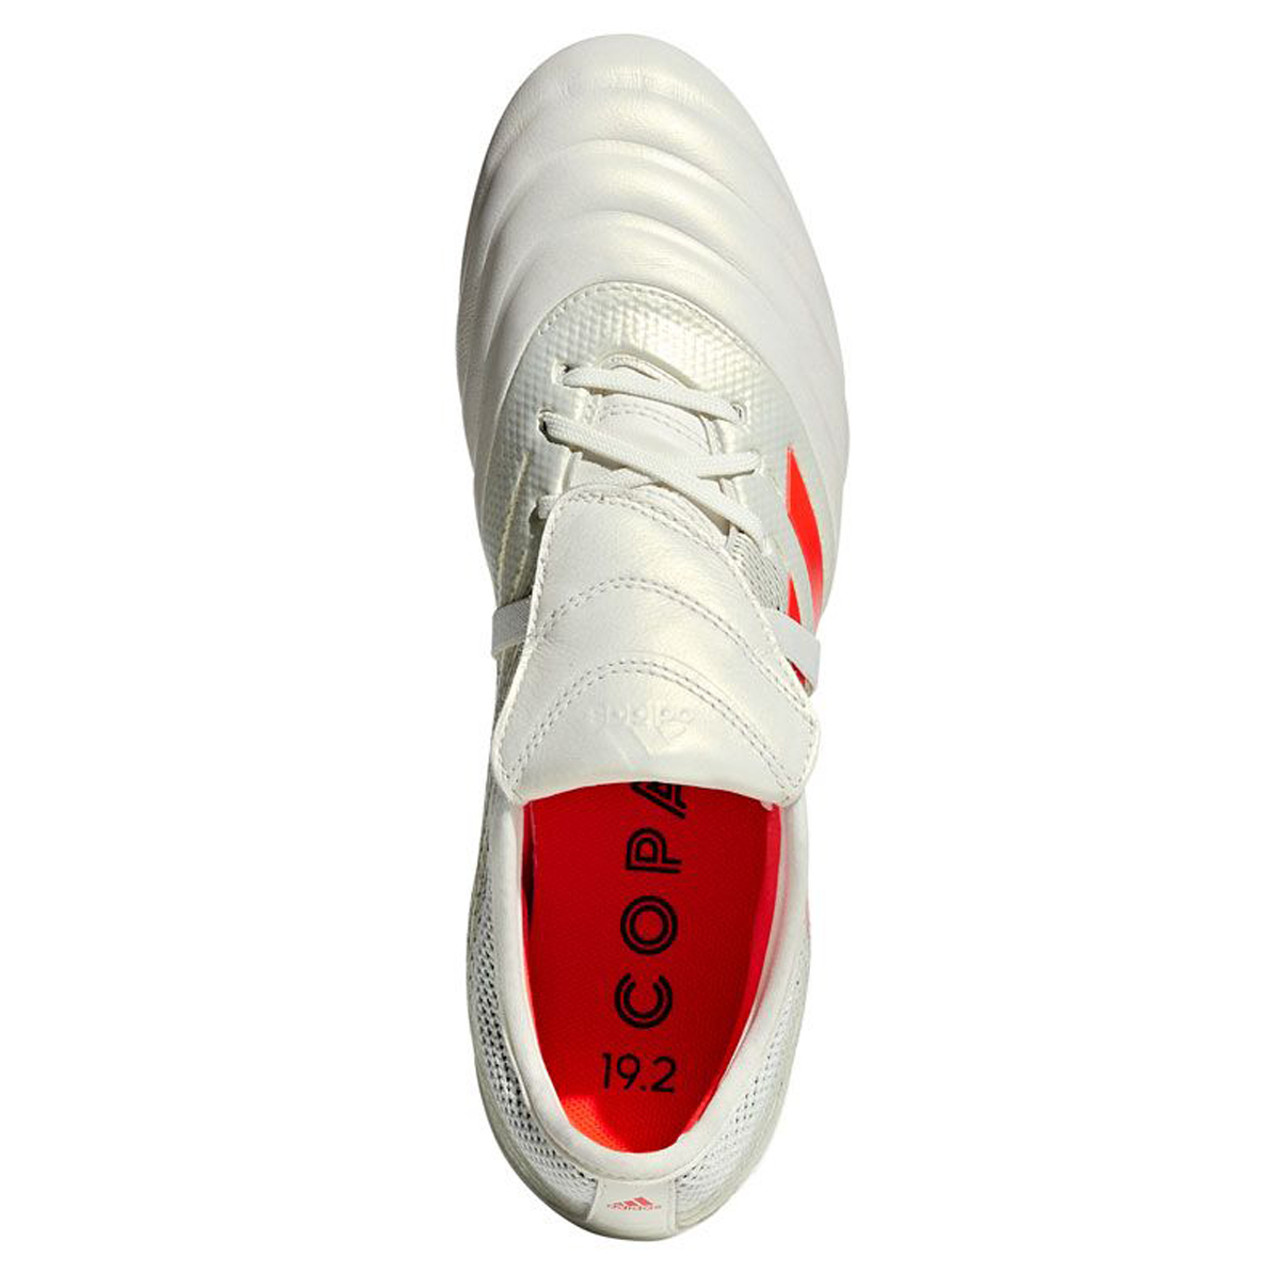 Adidas 2 Copa Men's Gloro WhiteSolar D98060 19 Soccer Fg Red Cleats KJ13uTlFc